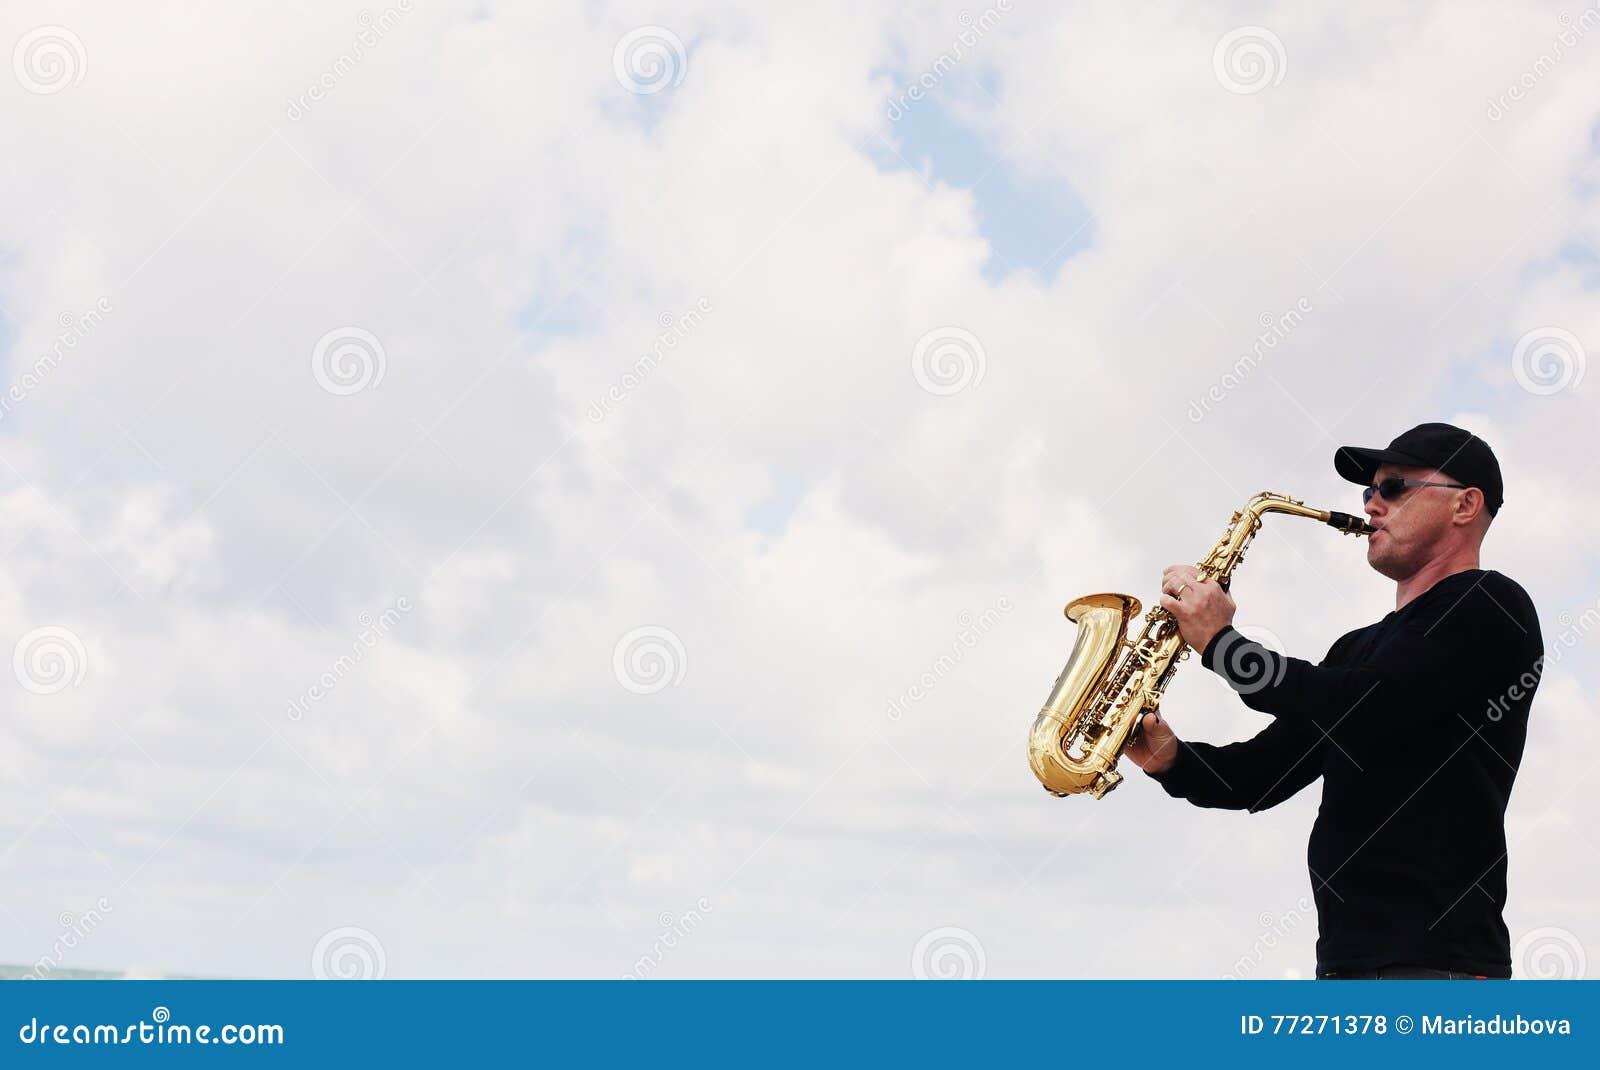 Саксофонист играя на саксофоне внешнем